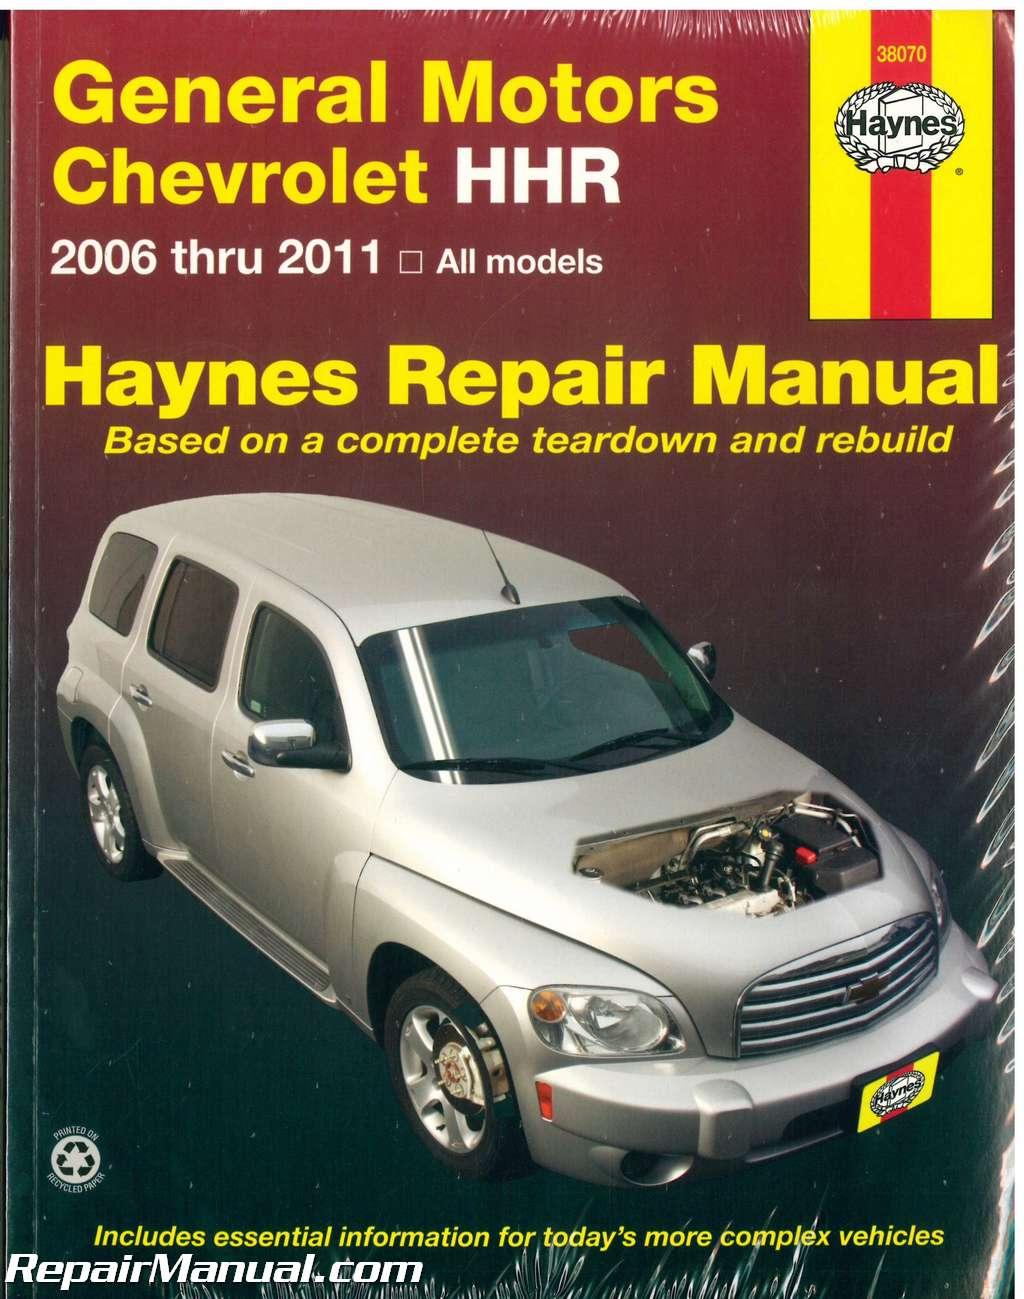 Chevrolet-HHR-2006-2011-Repair-Manual-by-Haynes_001. ...